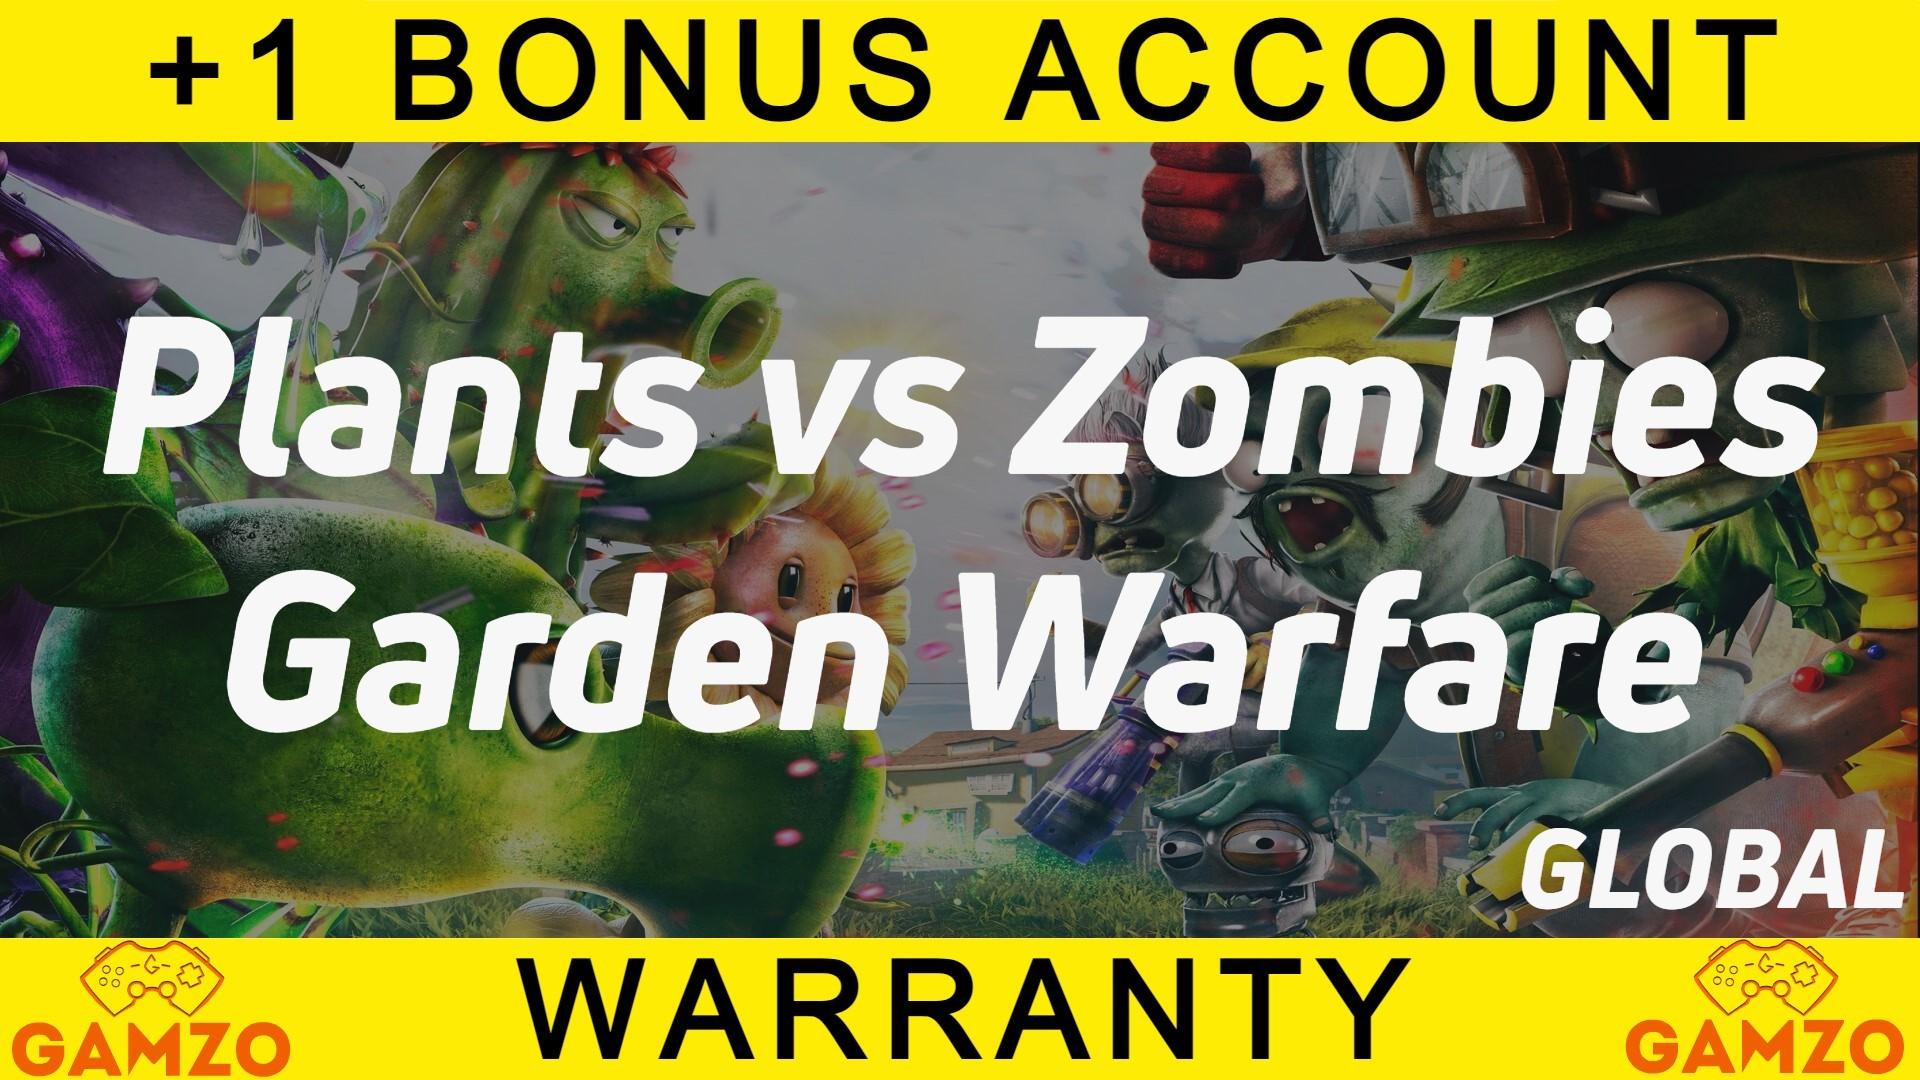 Plants vs. Zombies GW | Гарантия 5 лет | + Подарок